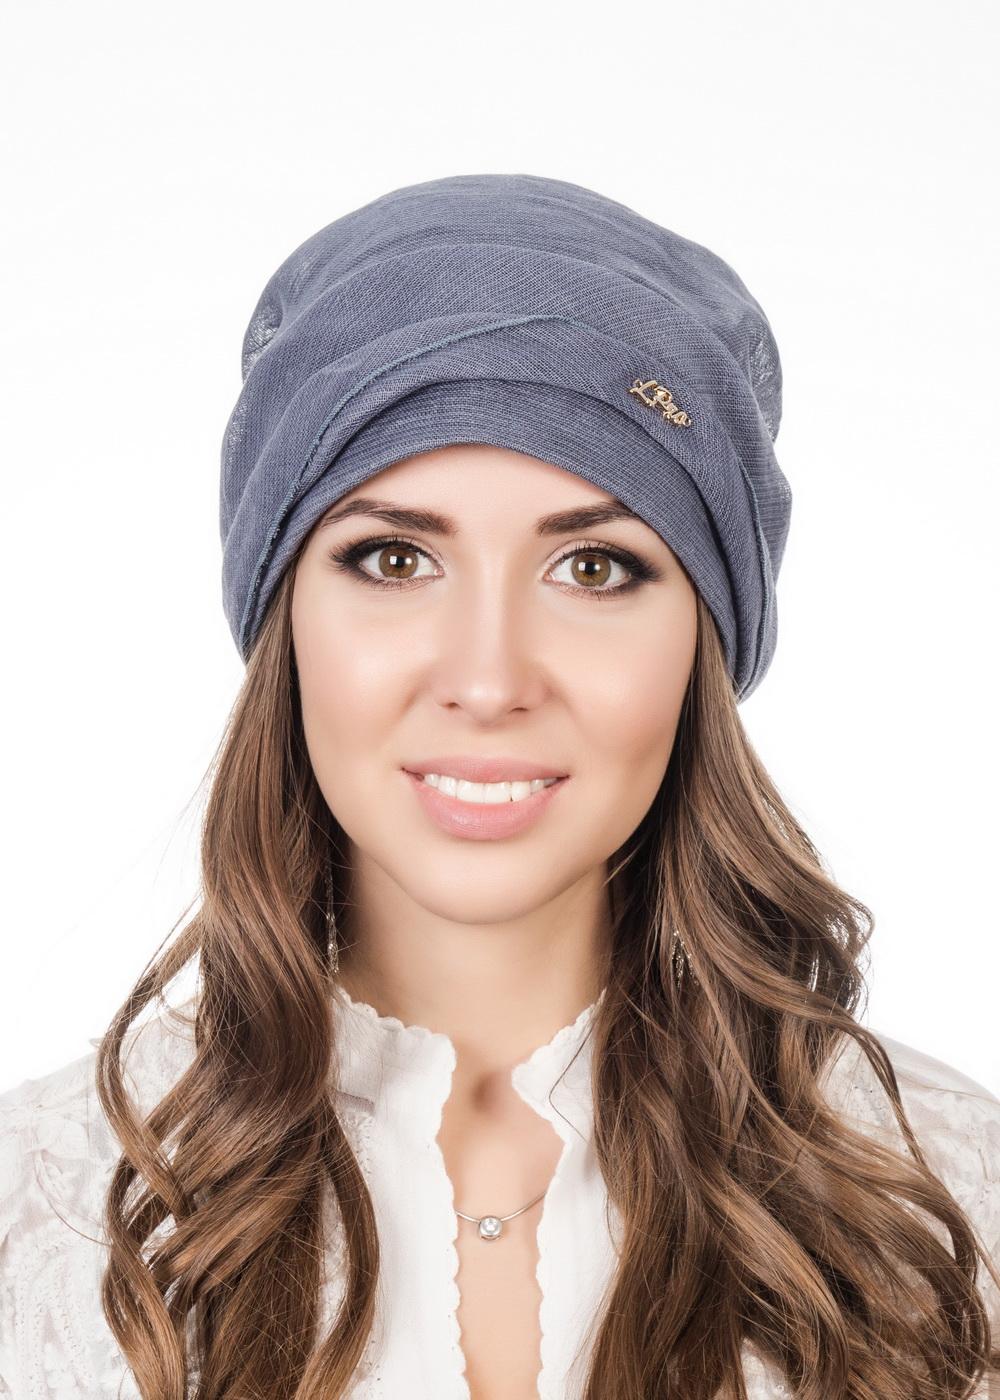 Бандана женская Level Pro Афродита, цвет: синий. 381077. Размер 56/58 бандана 4fun 4fun thermal pro wolf blue синий